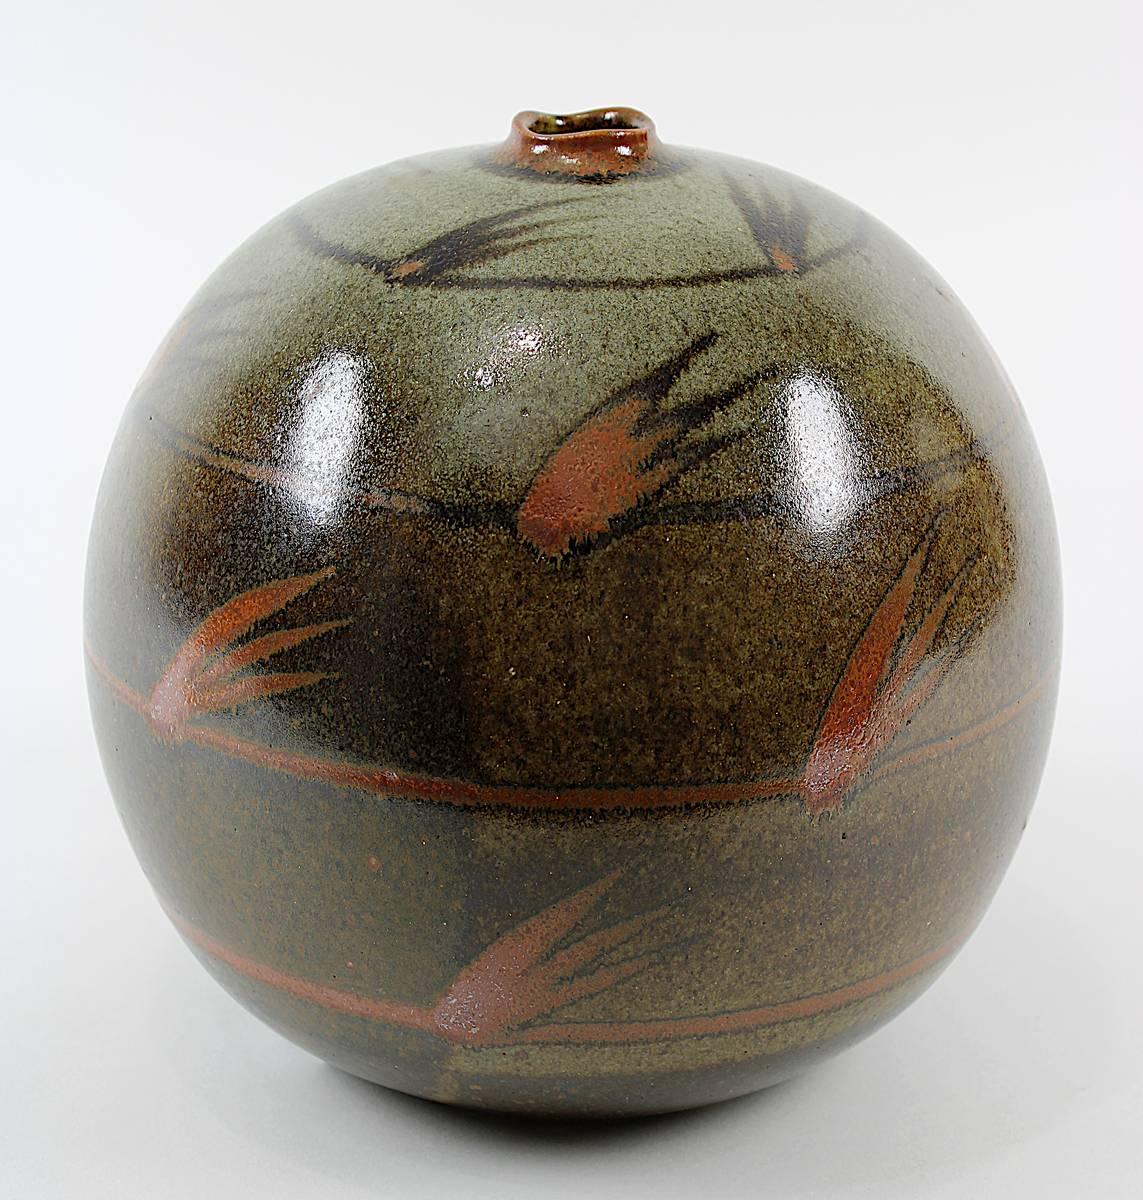 11-0036 - Kerstan, Horst (Frankfurt a. M. 1941 - 2005  Kandern), Studiokeramik Art Pottery - Kugelvase, 1979 Image